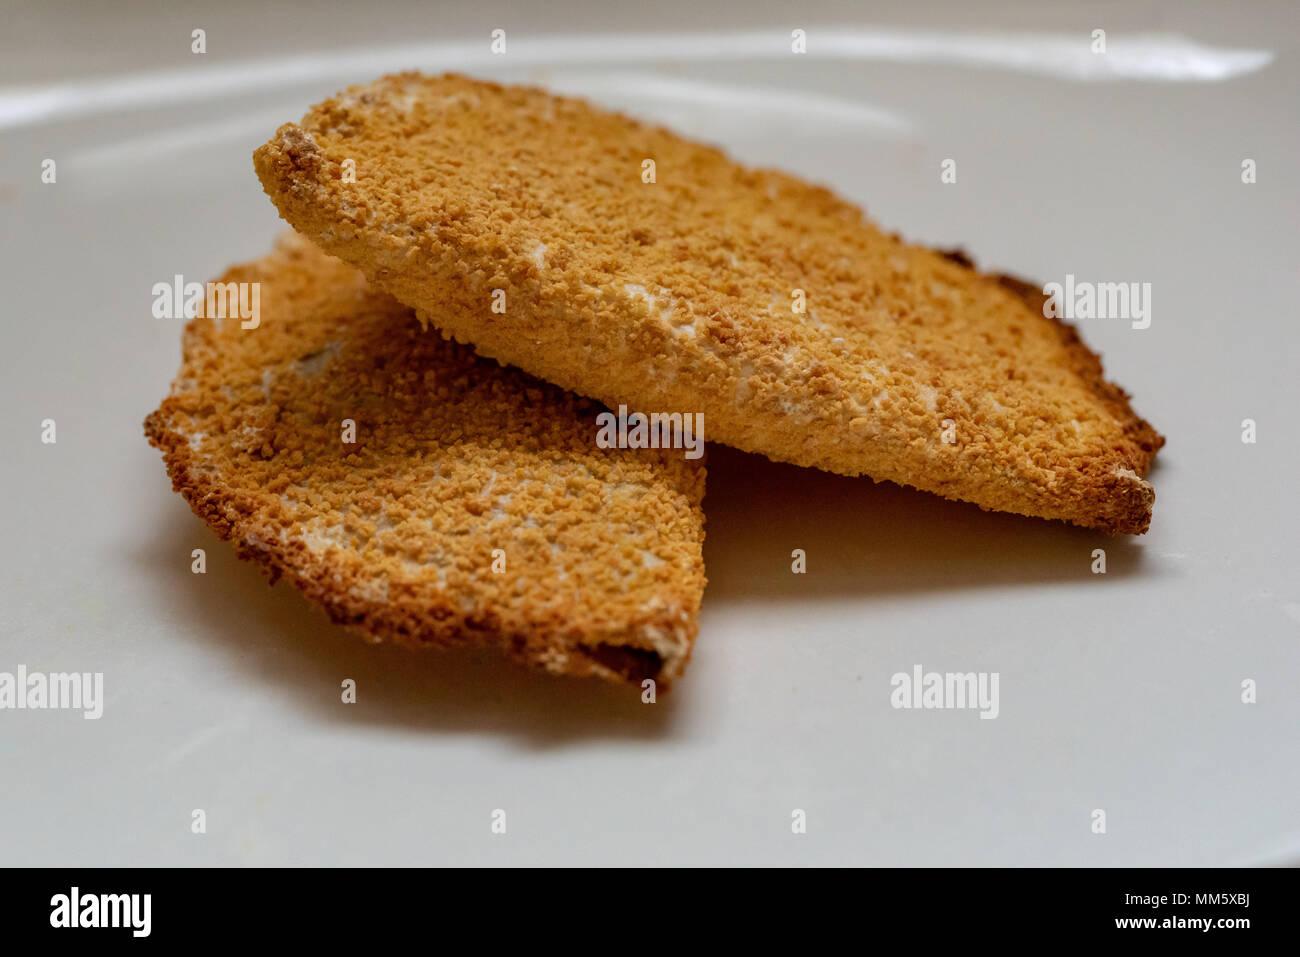 Findus crispy pancakes - Stock Image